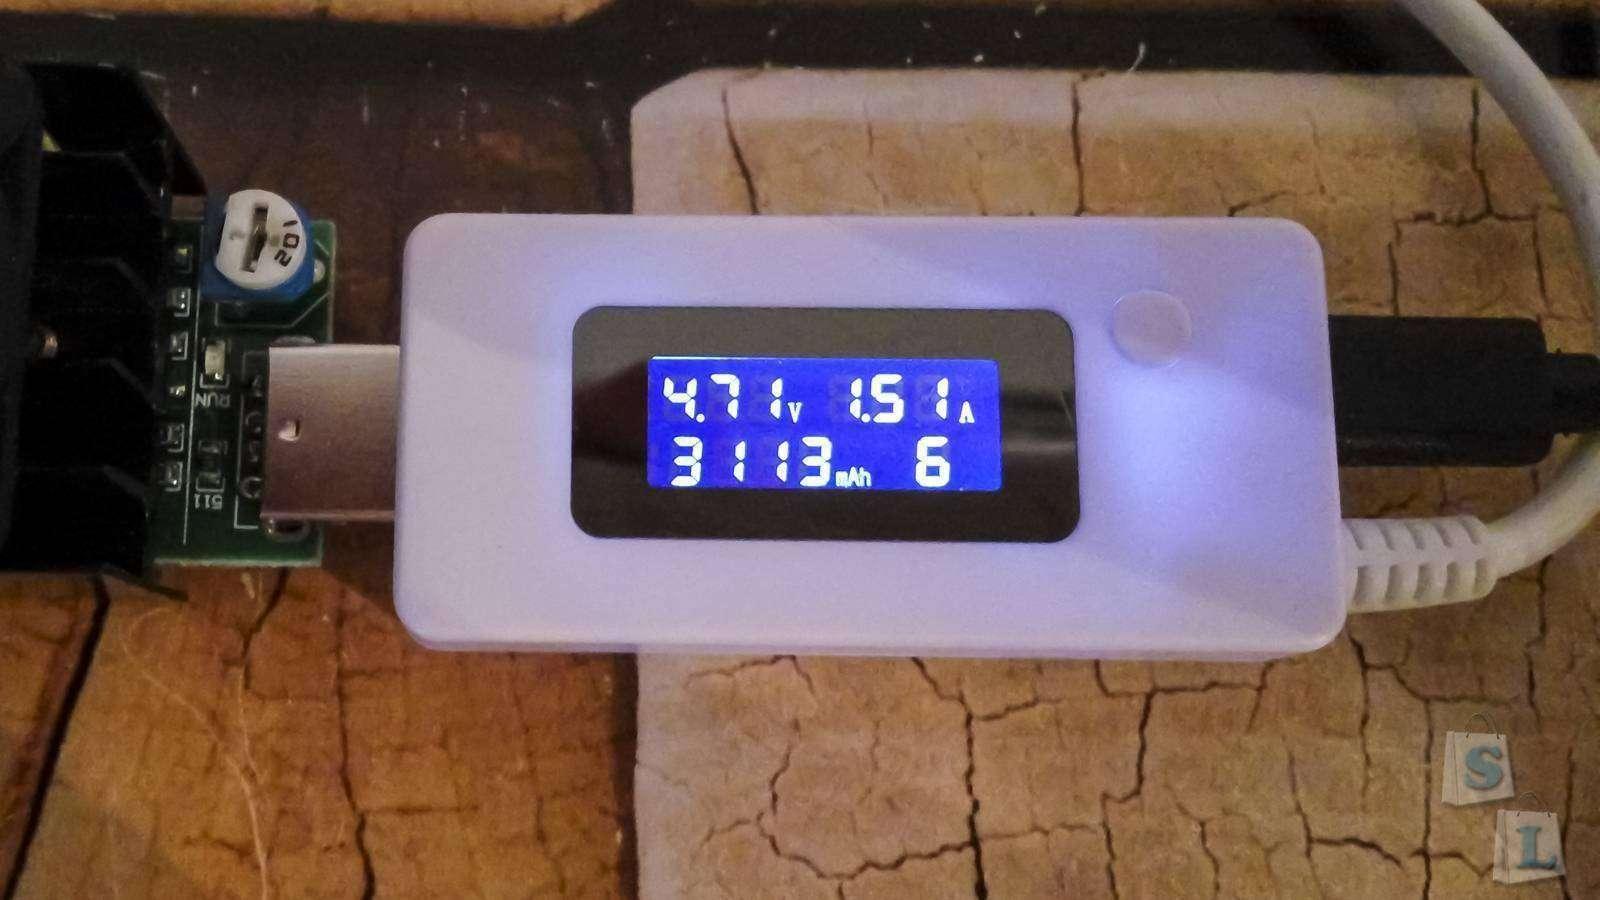 Banggood: Кабель USB micro USB REMAX, длиной 2 метра